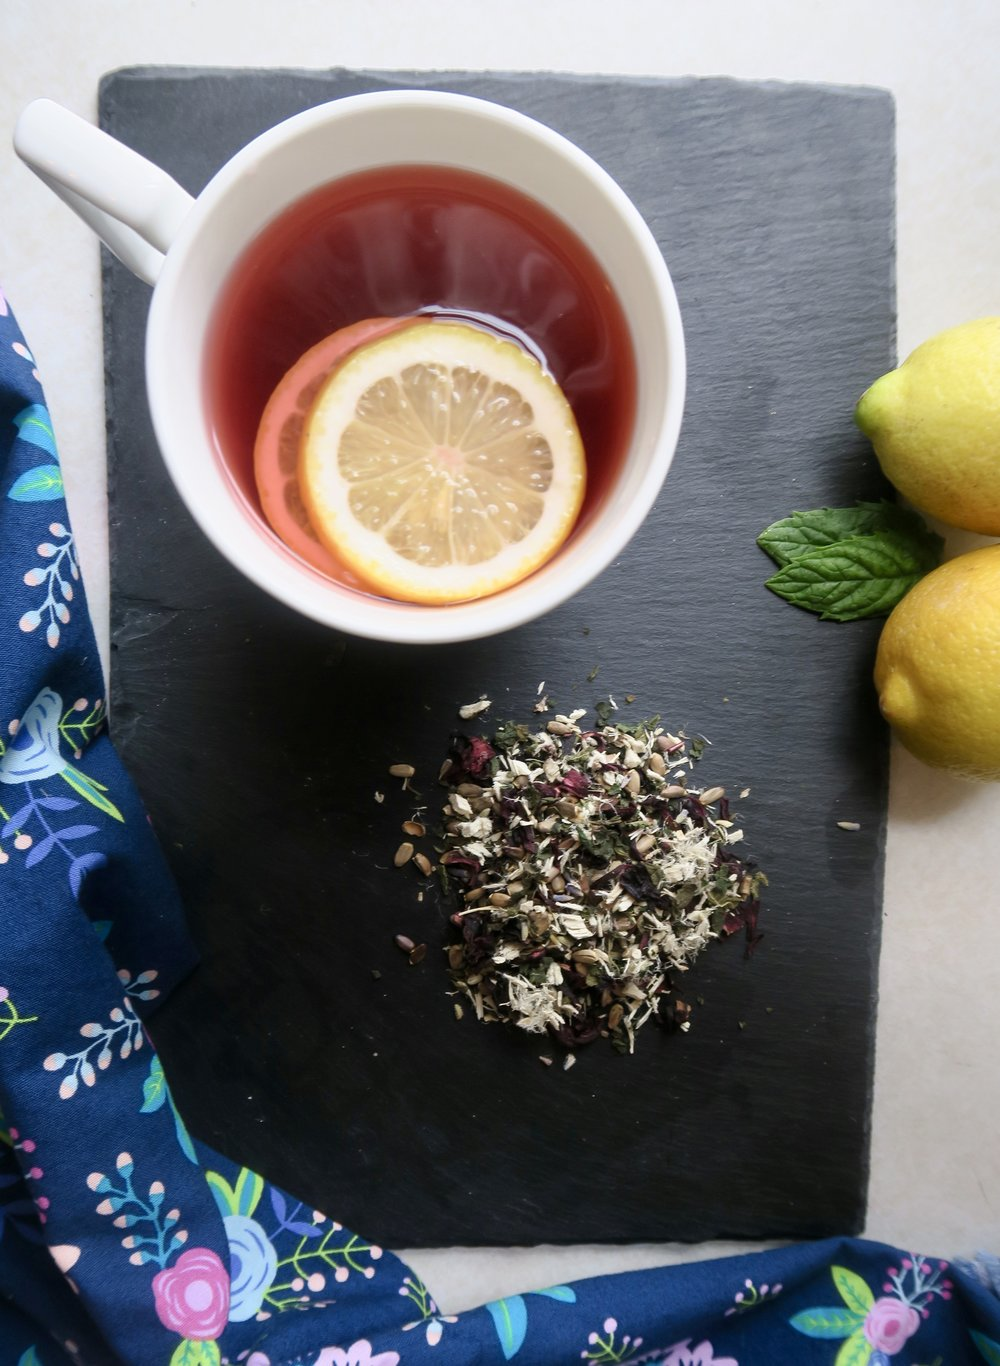 Lake Superior kitchen, Duluth food, detox tea